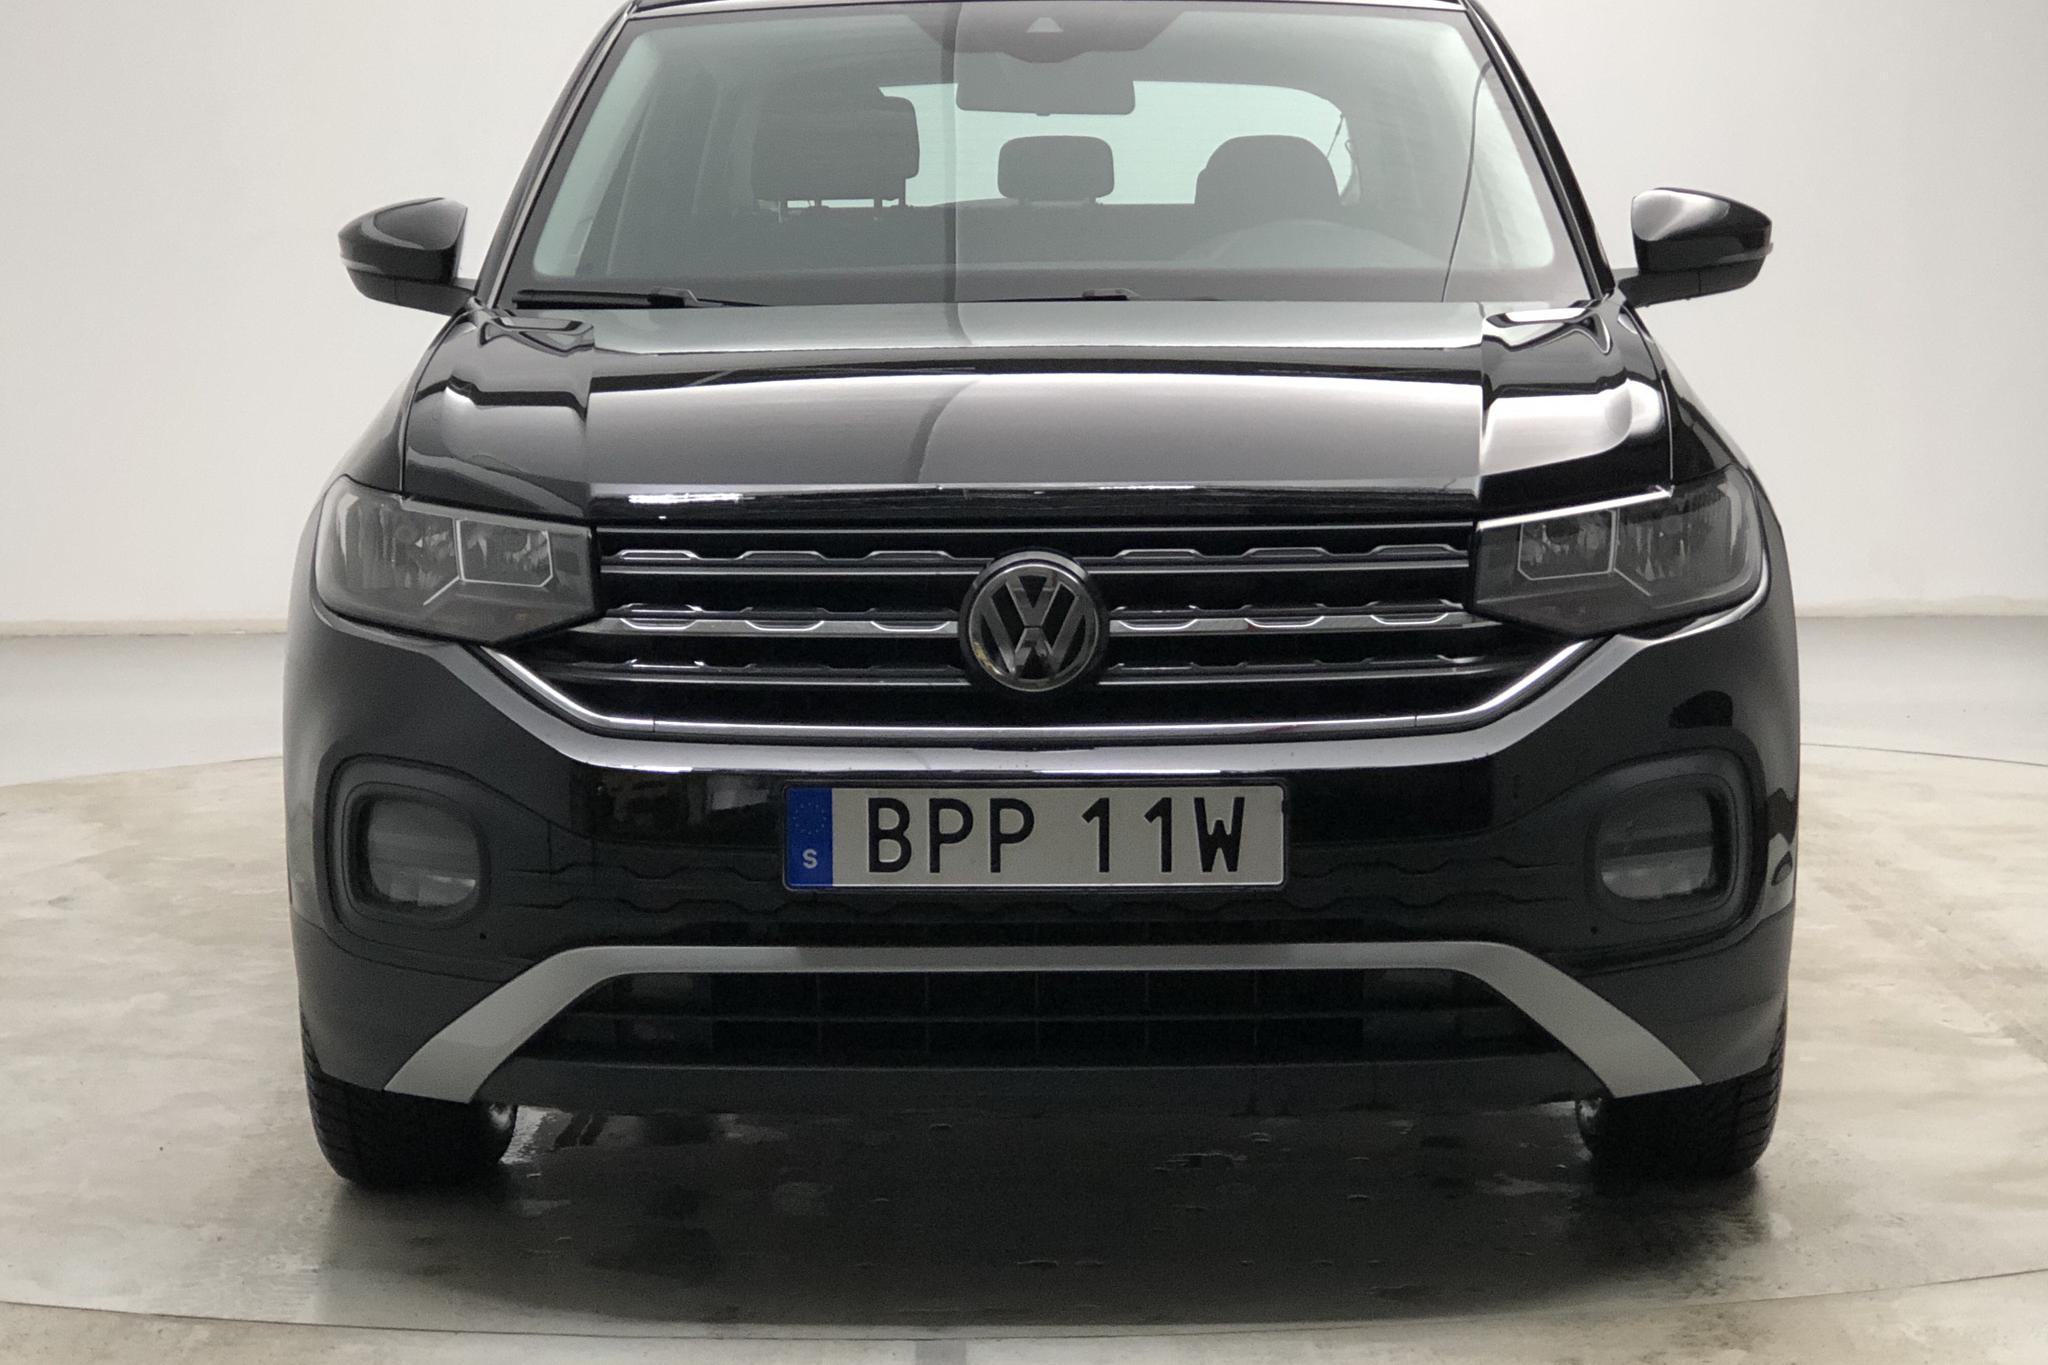 VW T-Cross 1.0 TSI (95hk) - 25 730 km - Manual - black - 2019